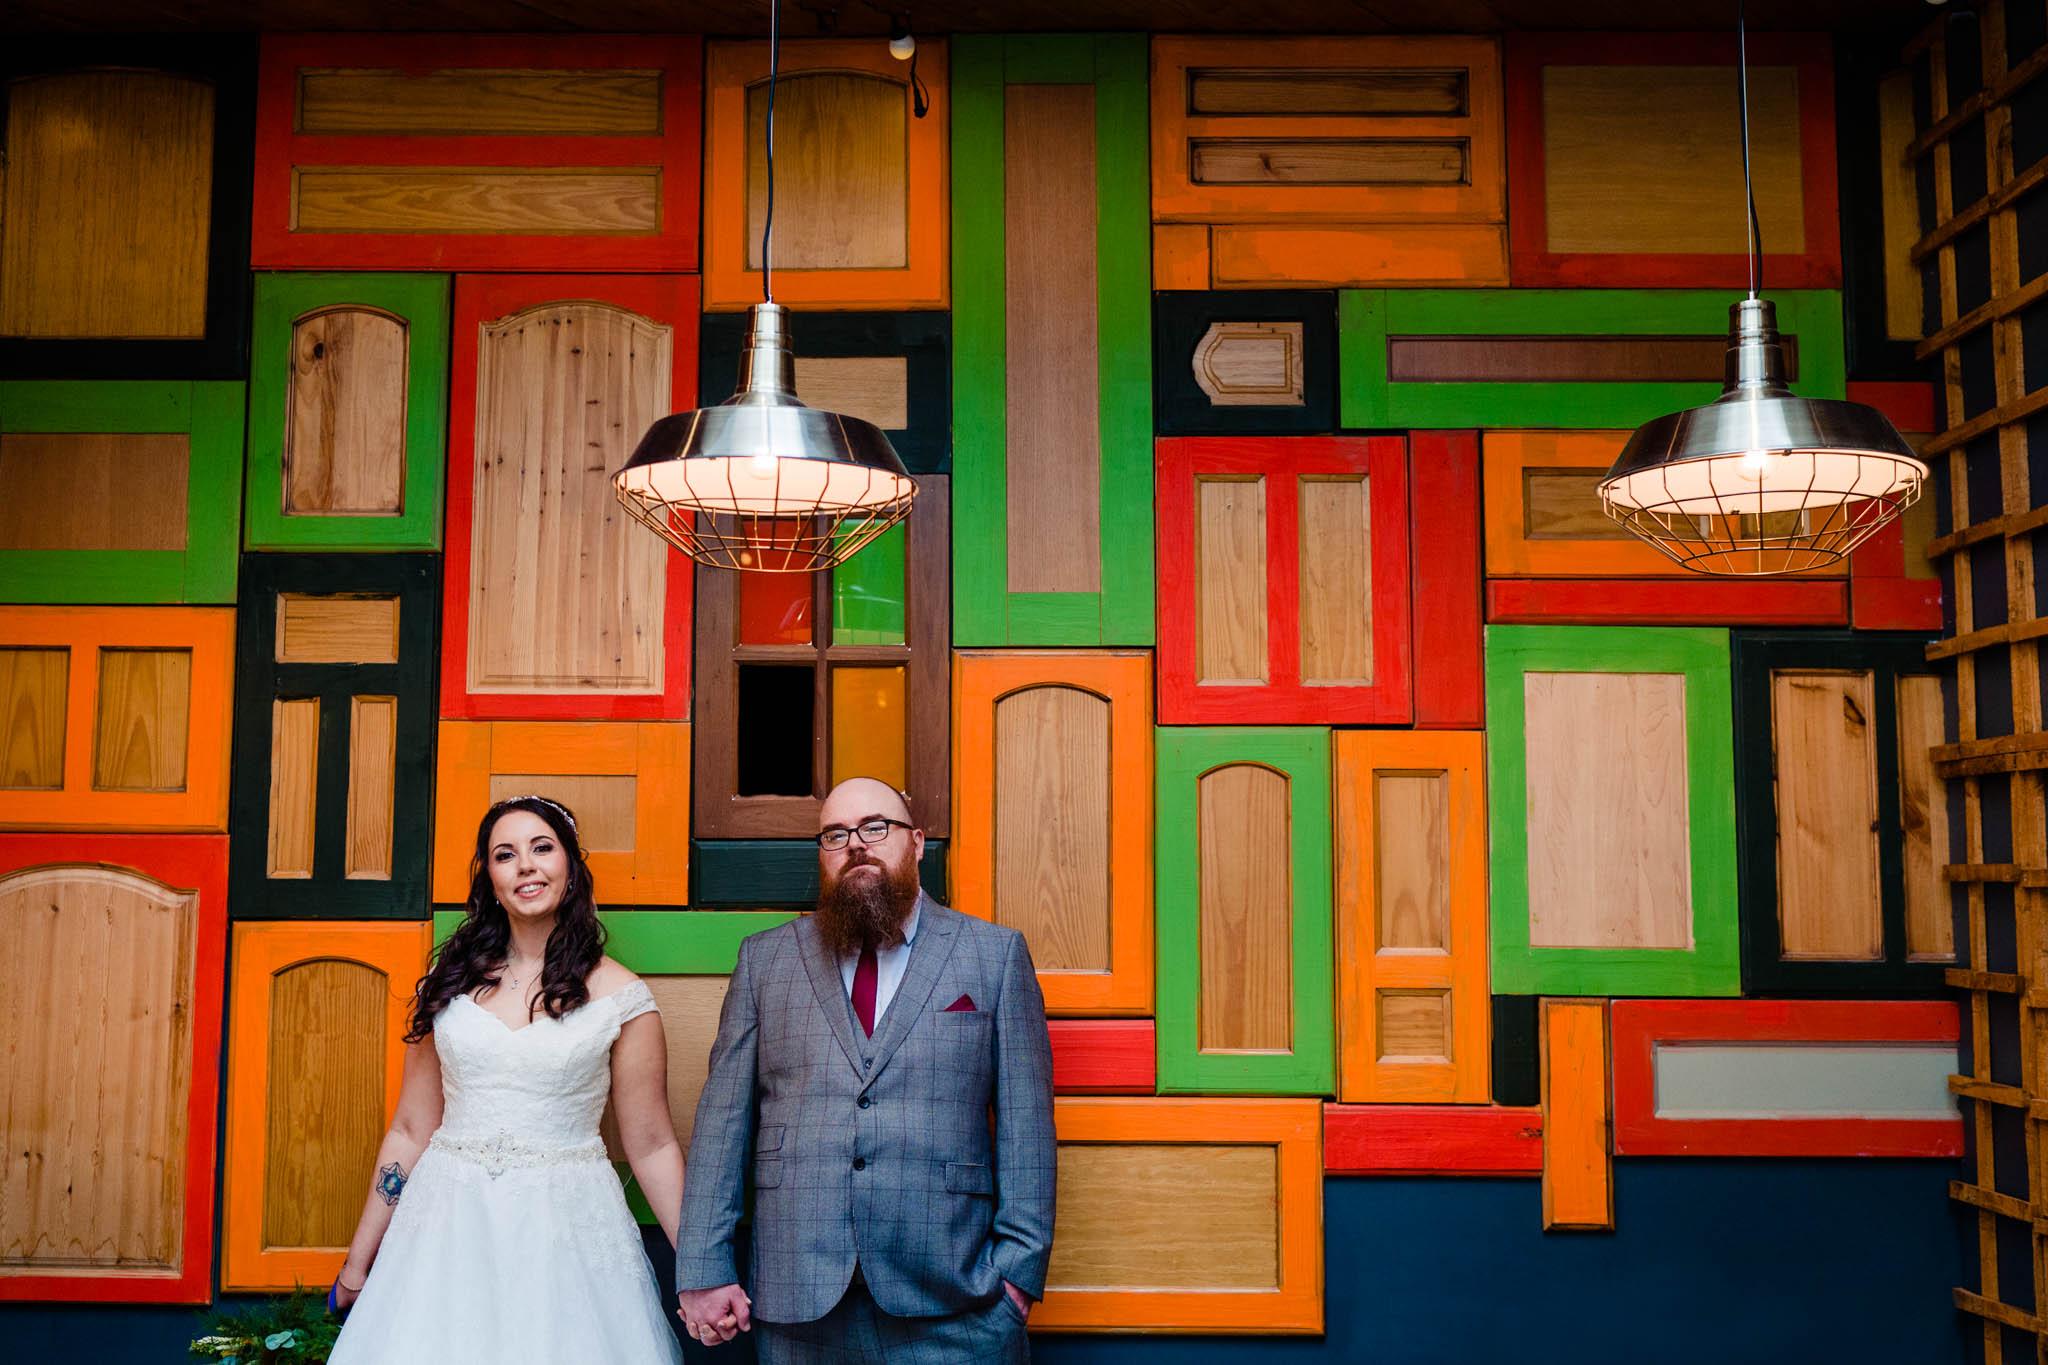 colourful wedding photo - vicki clayson photography